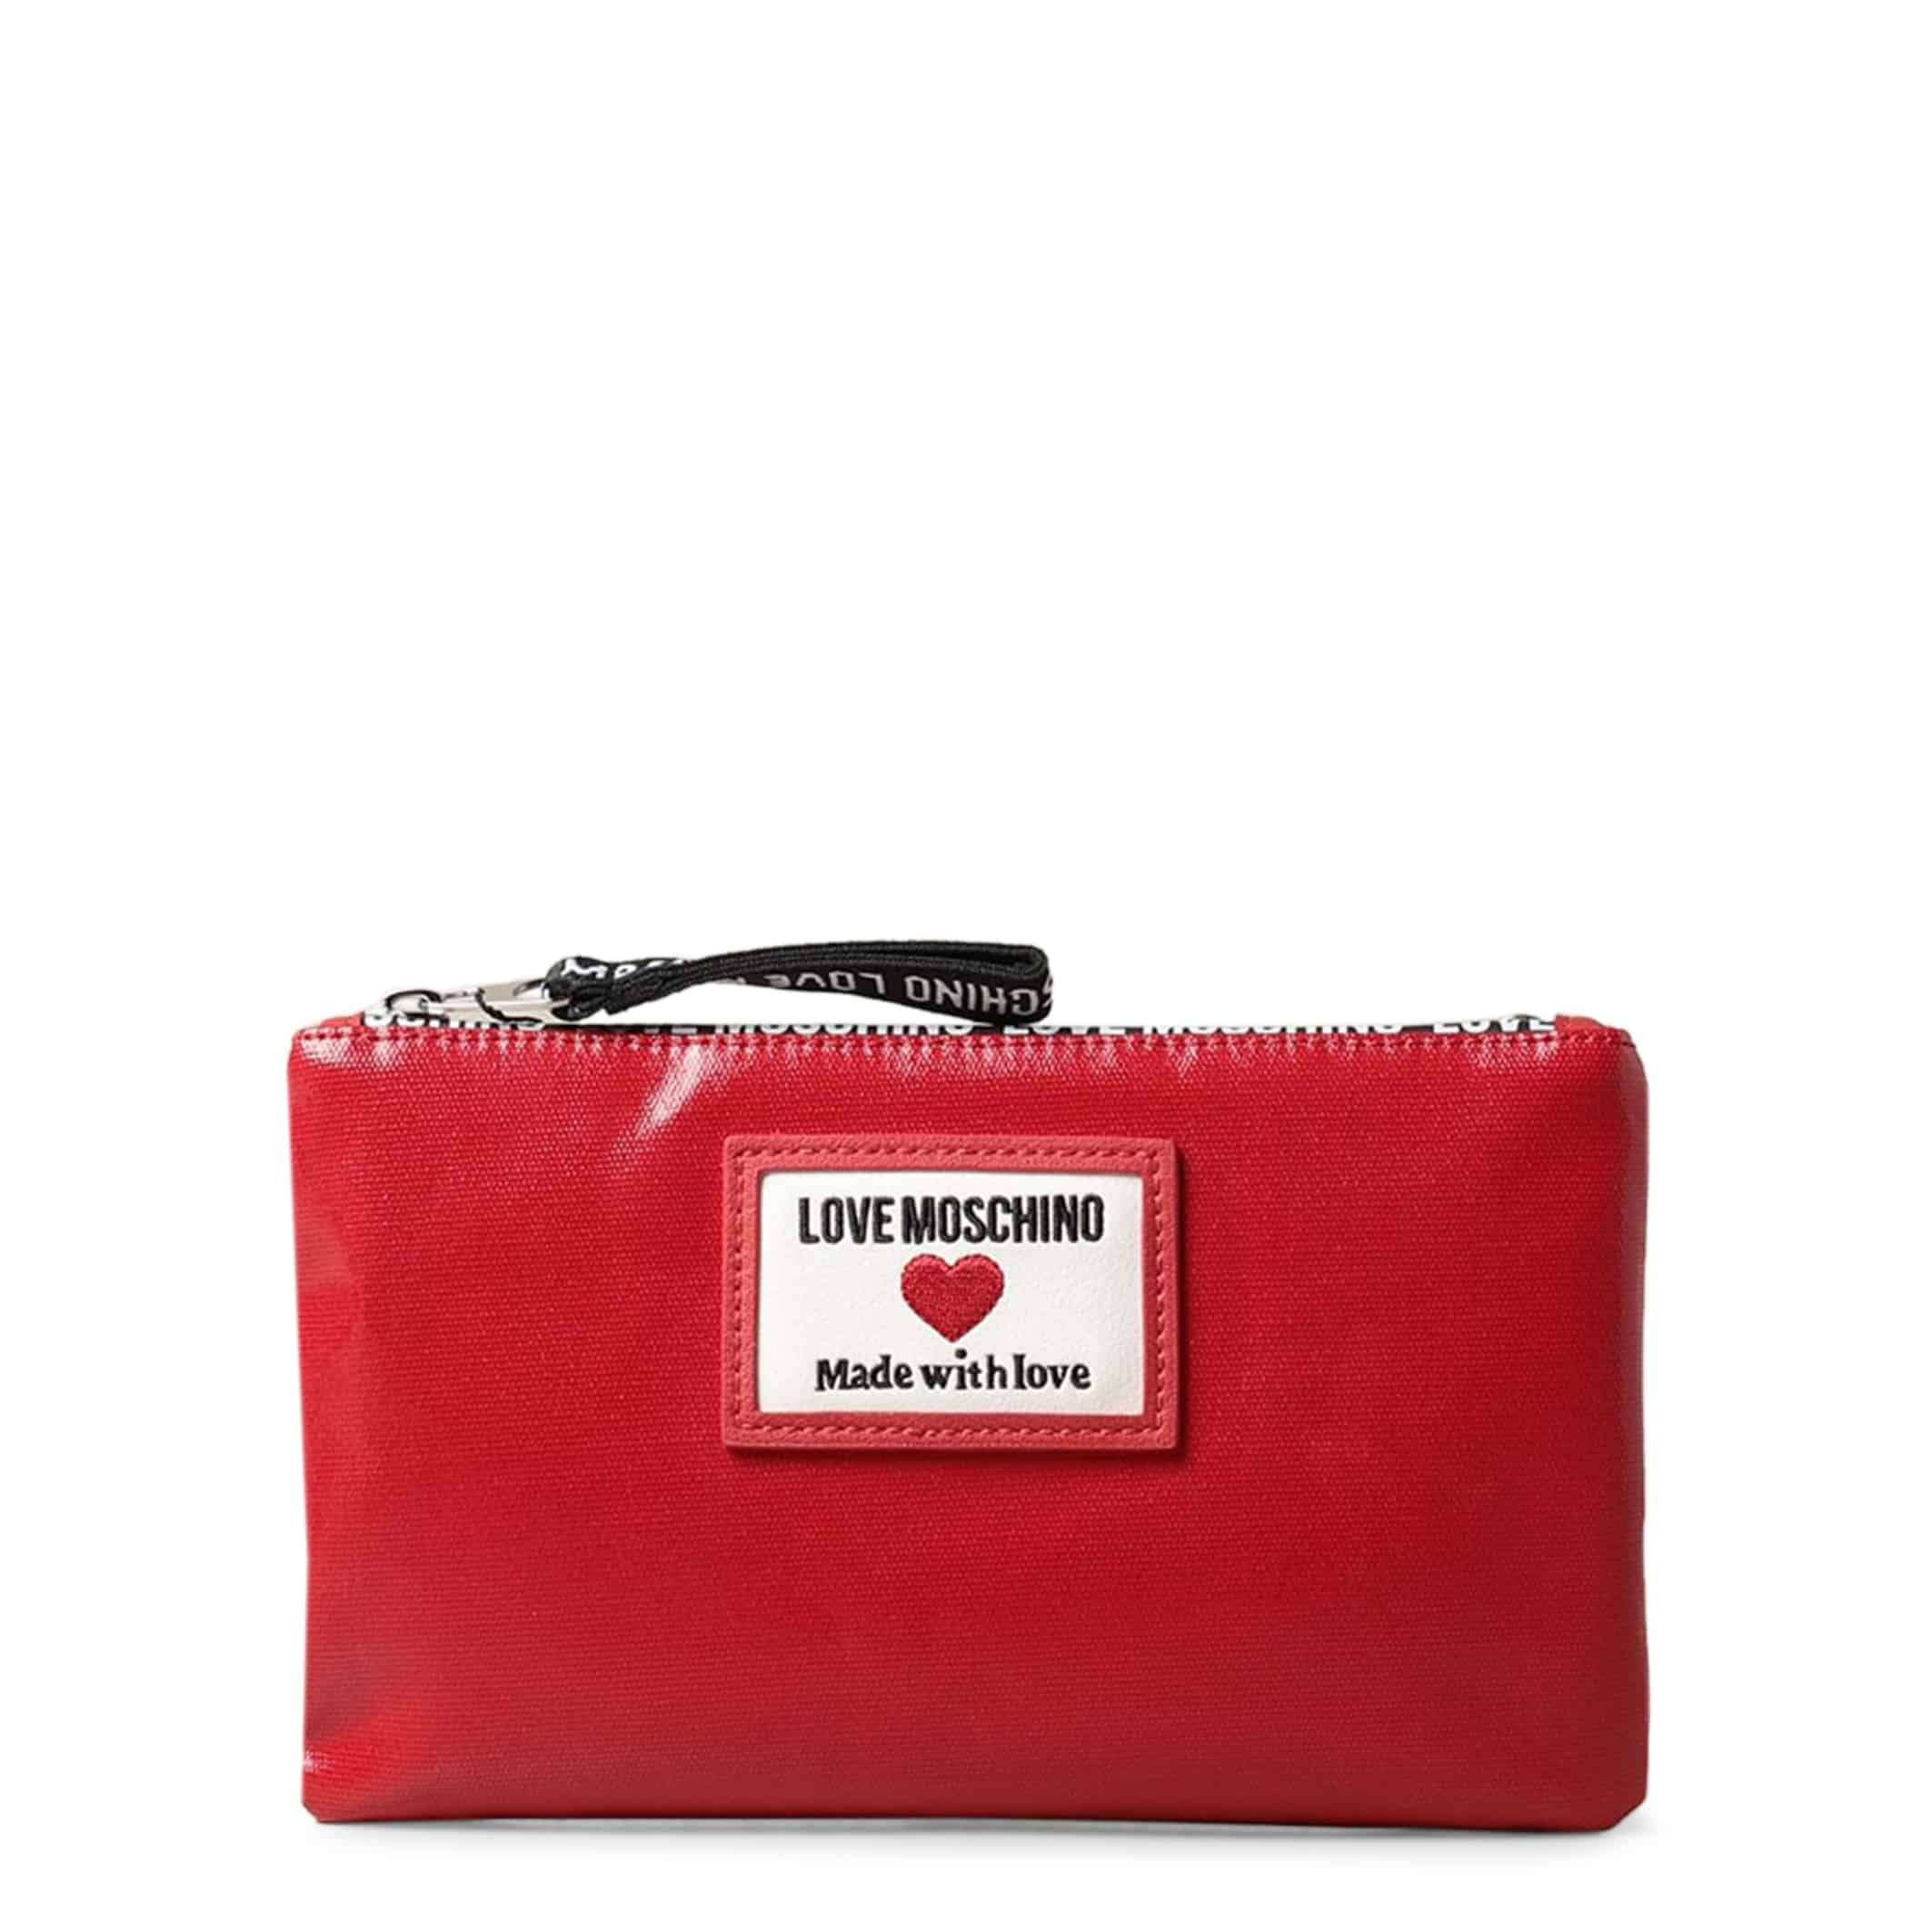 Love Moschino – JC4037PP1CLC1 – Rood Designeritems.nl